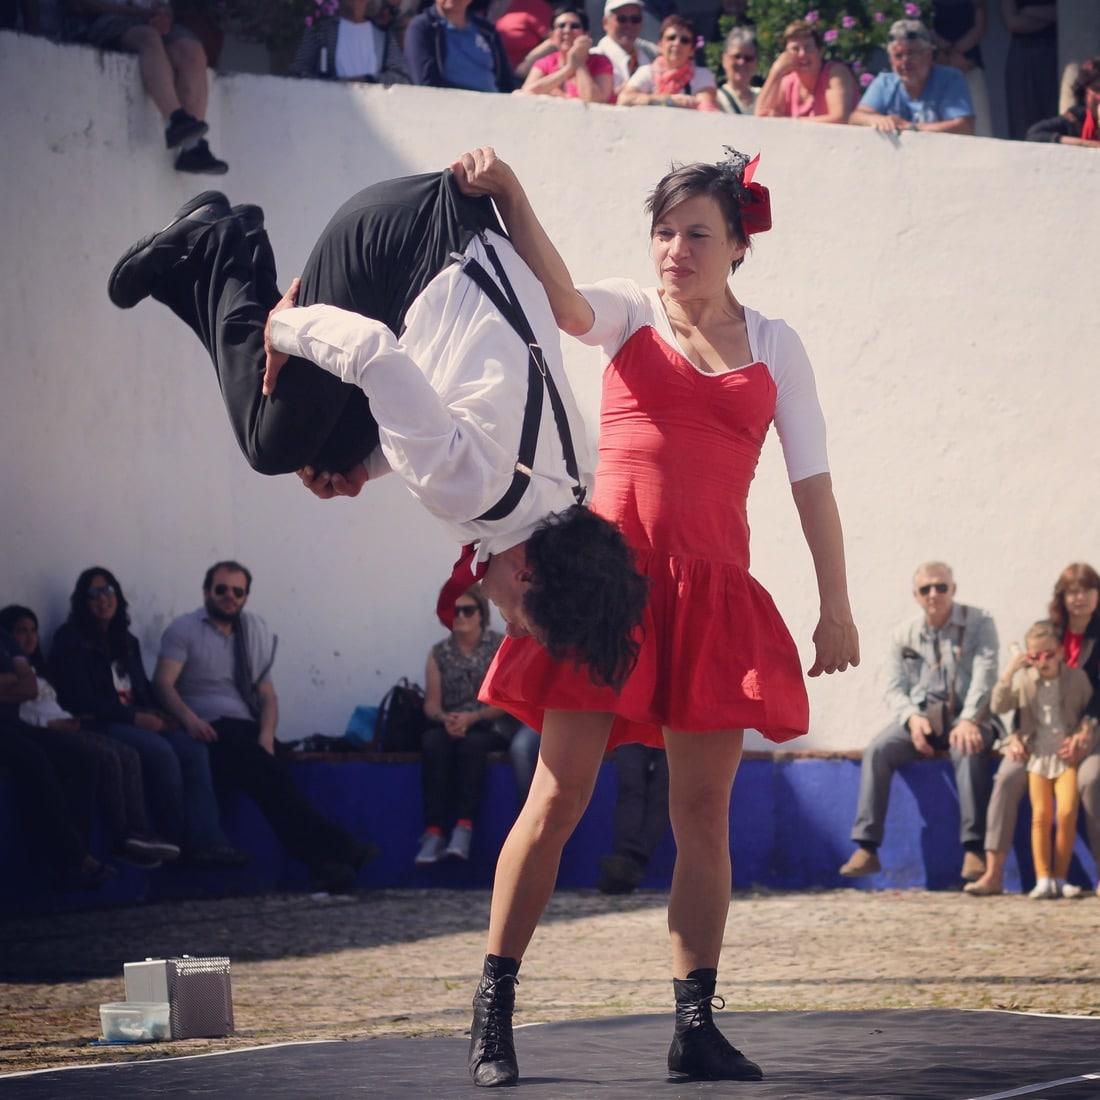 NANIROSSI-ObidosBuskersFestival-11